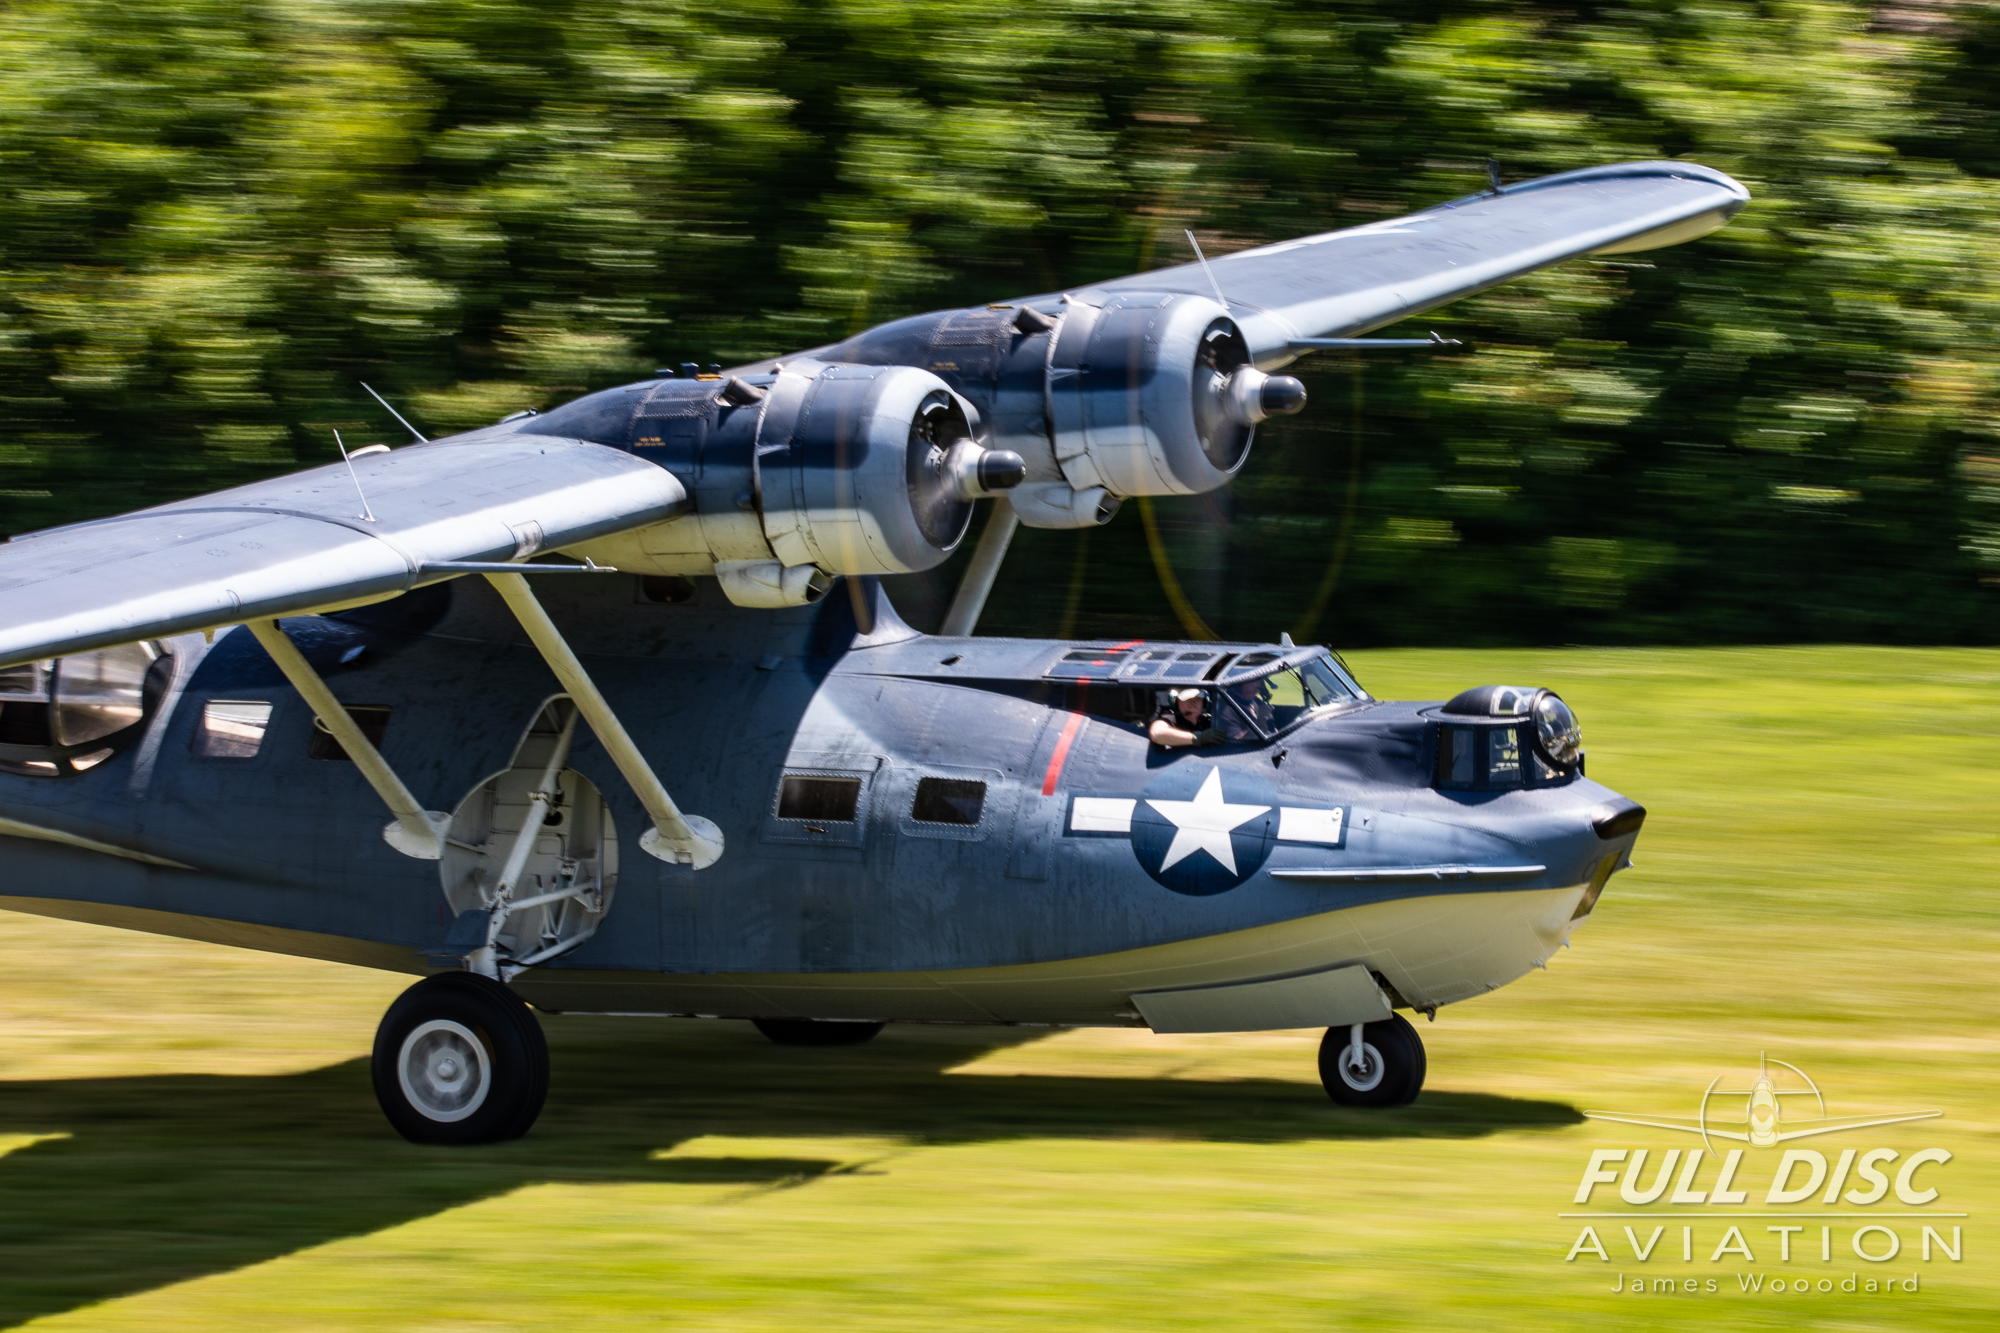 WarbirdsOverTheBeach_FullDiscAviation_JamesWoodard-May 18, 2019-90.jpg